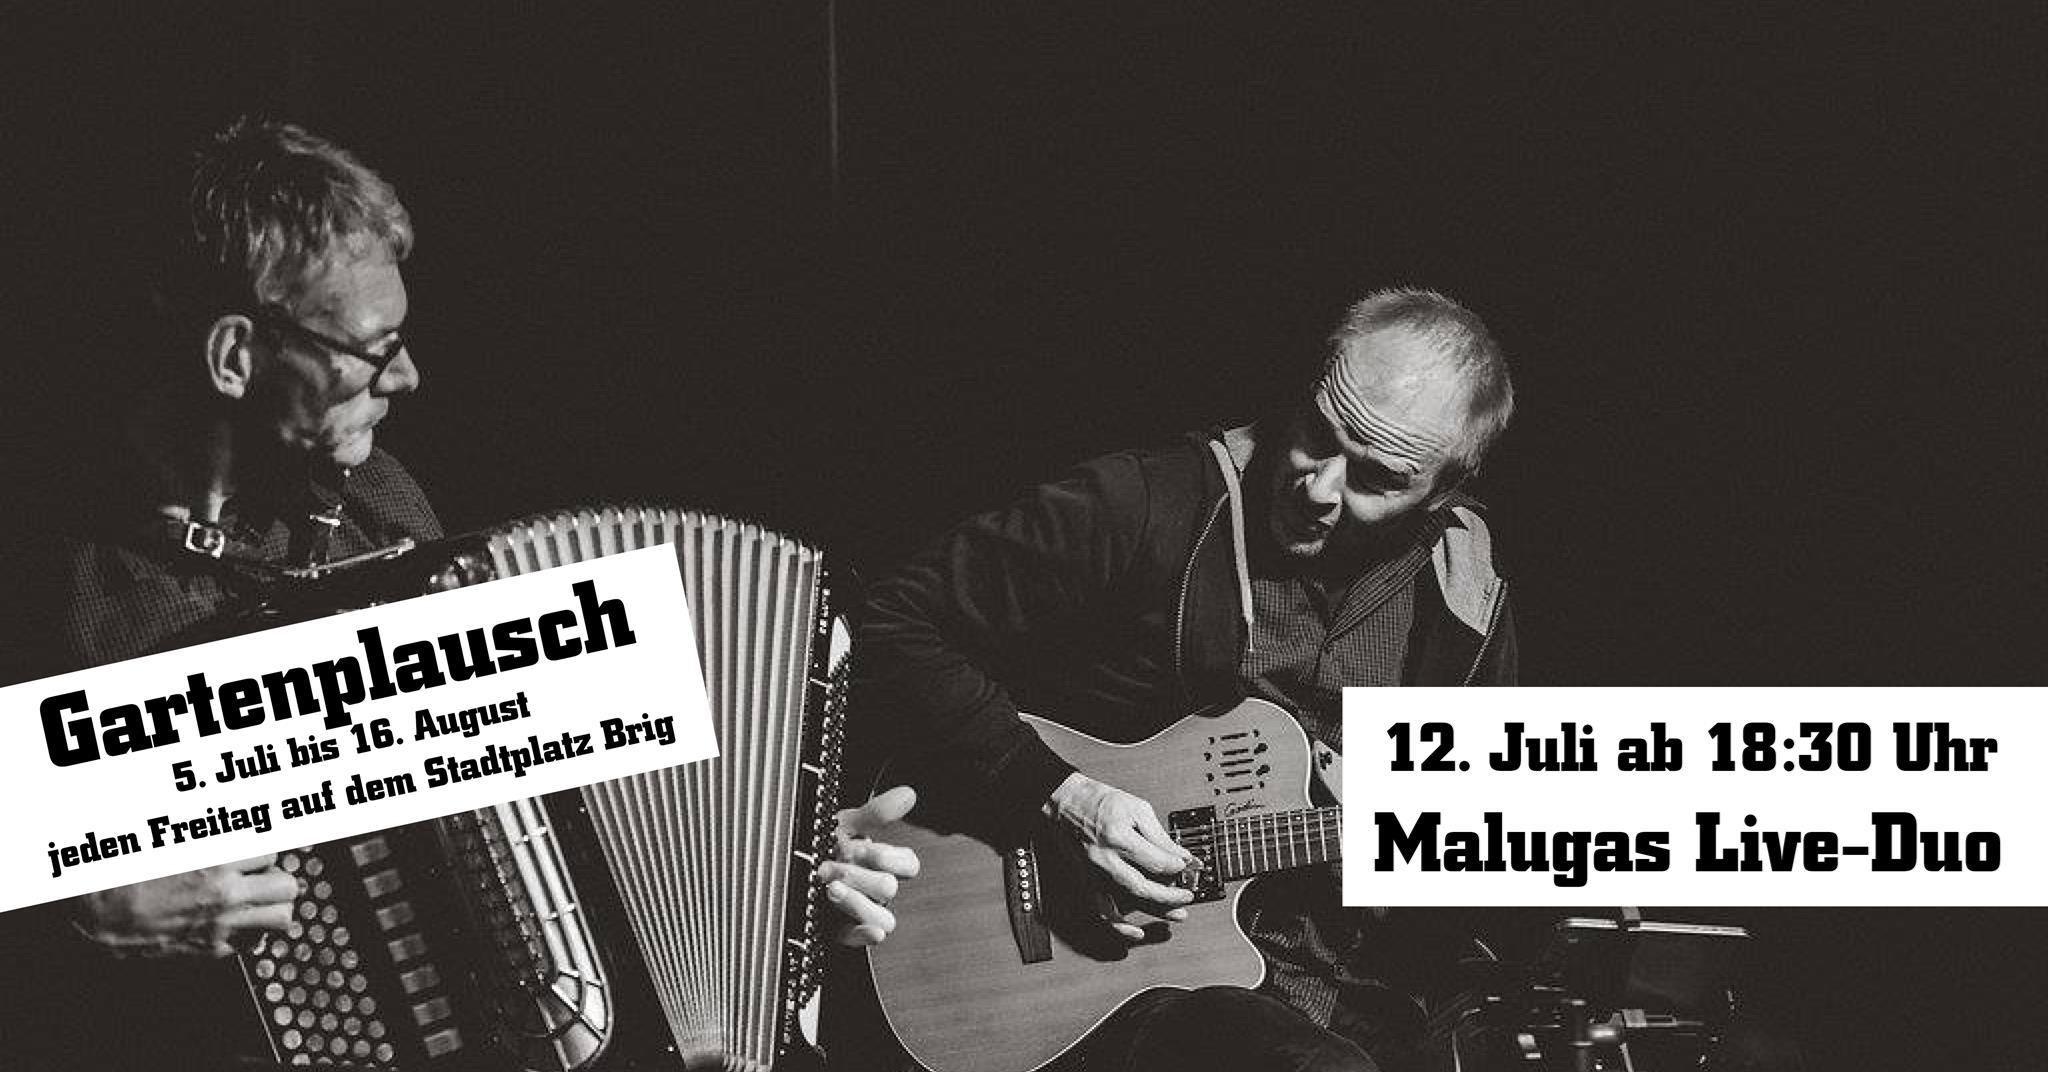 Malugas Live-Duo